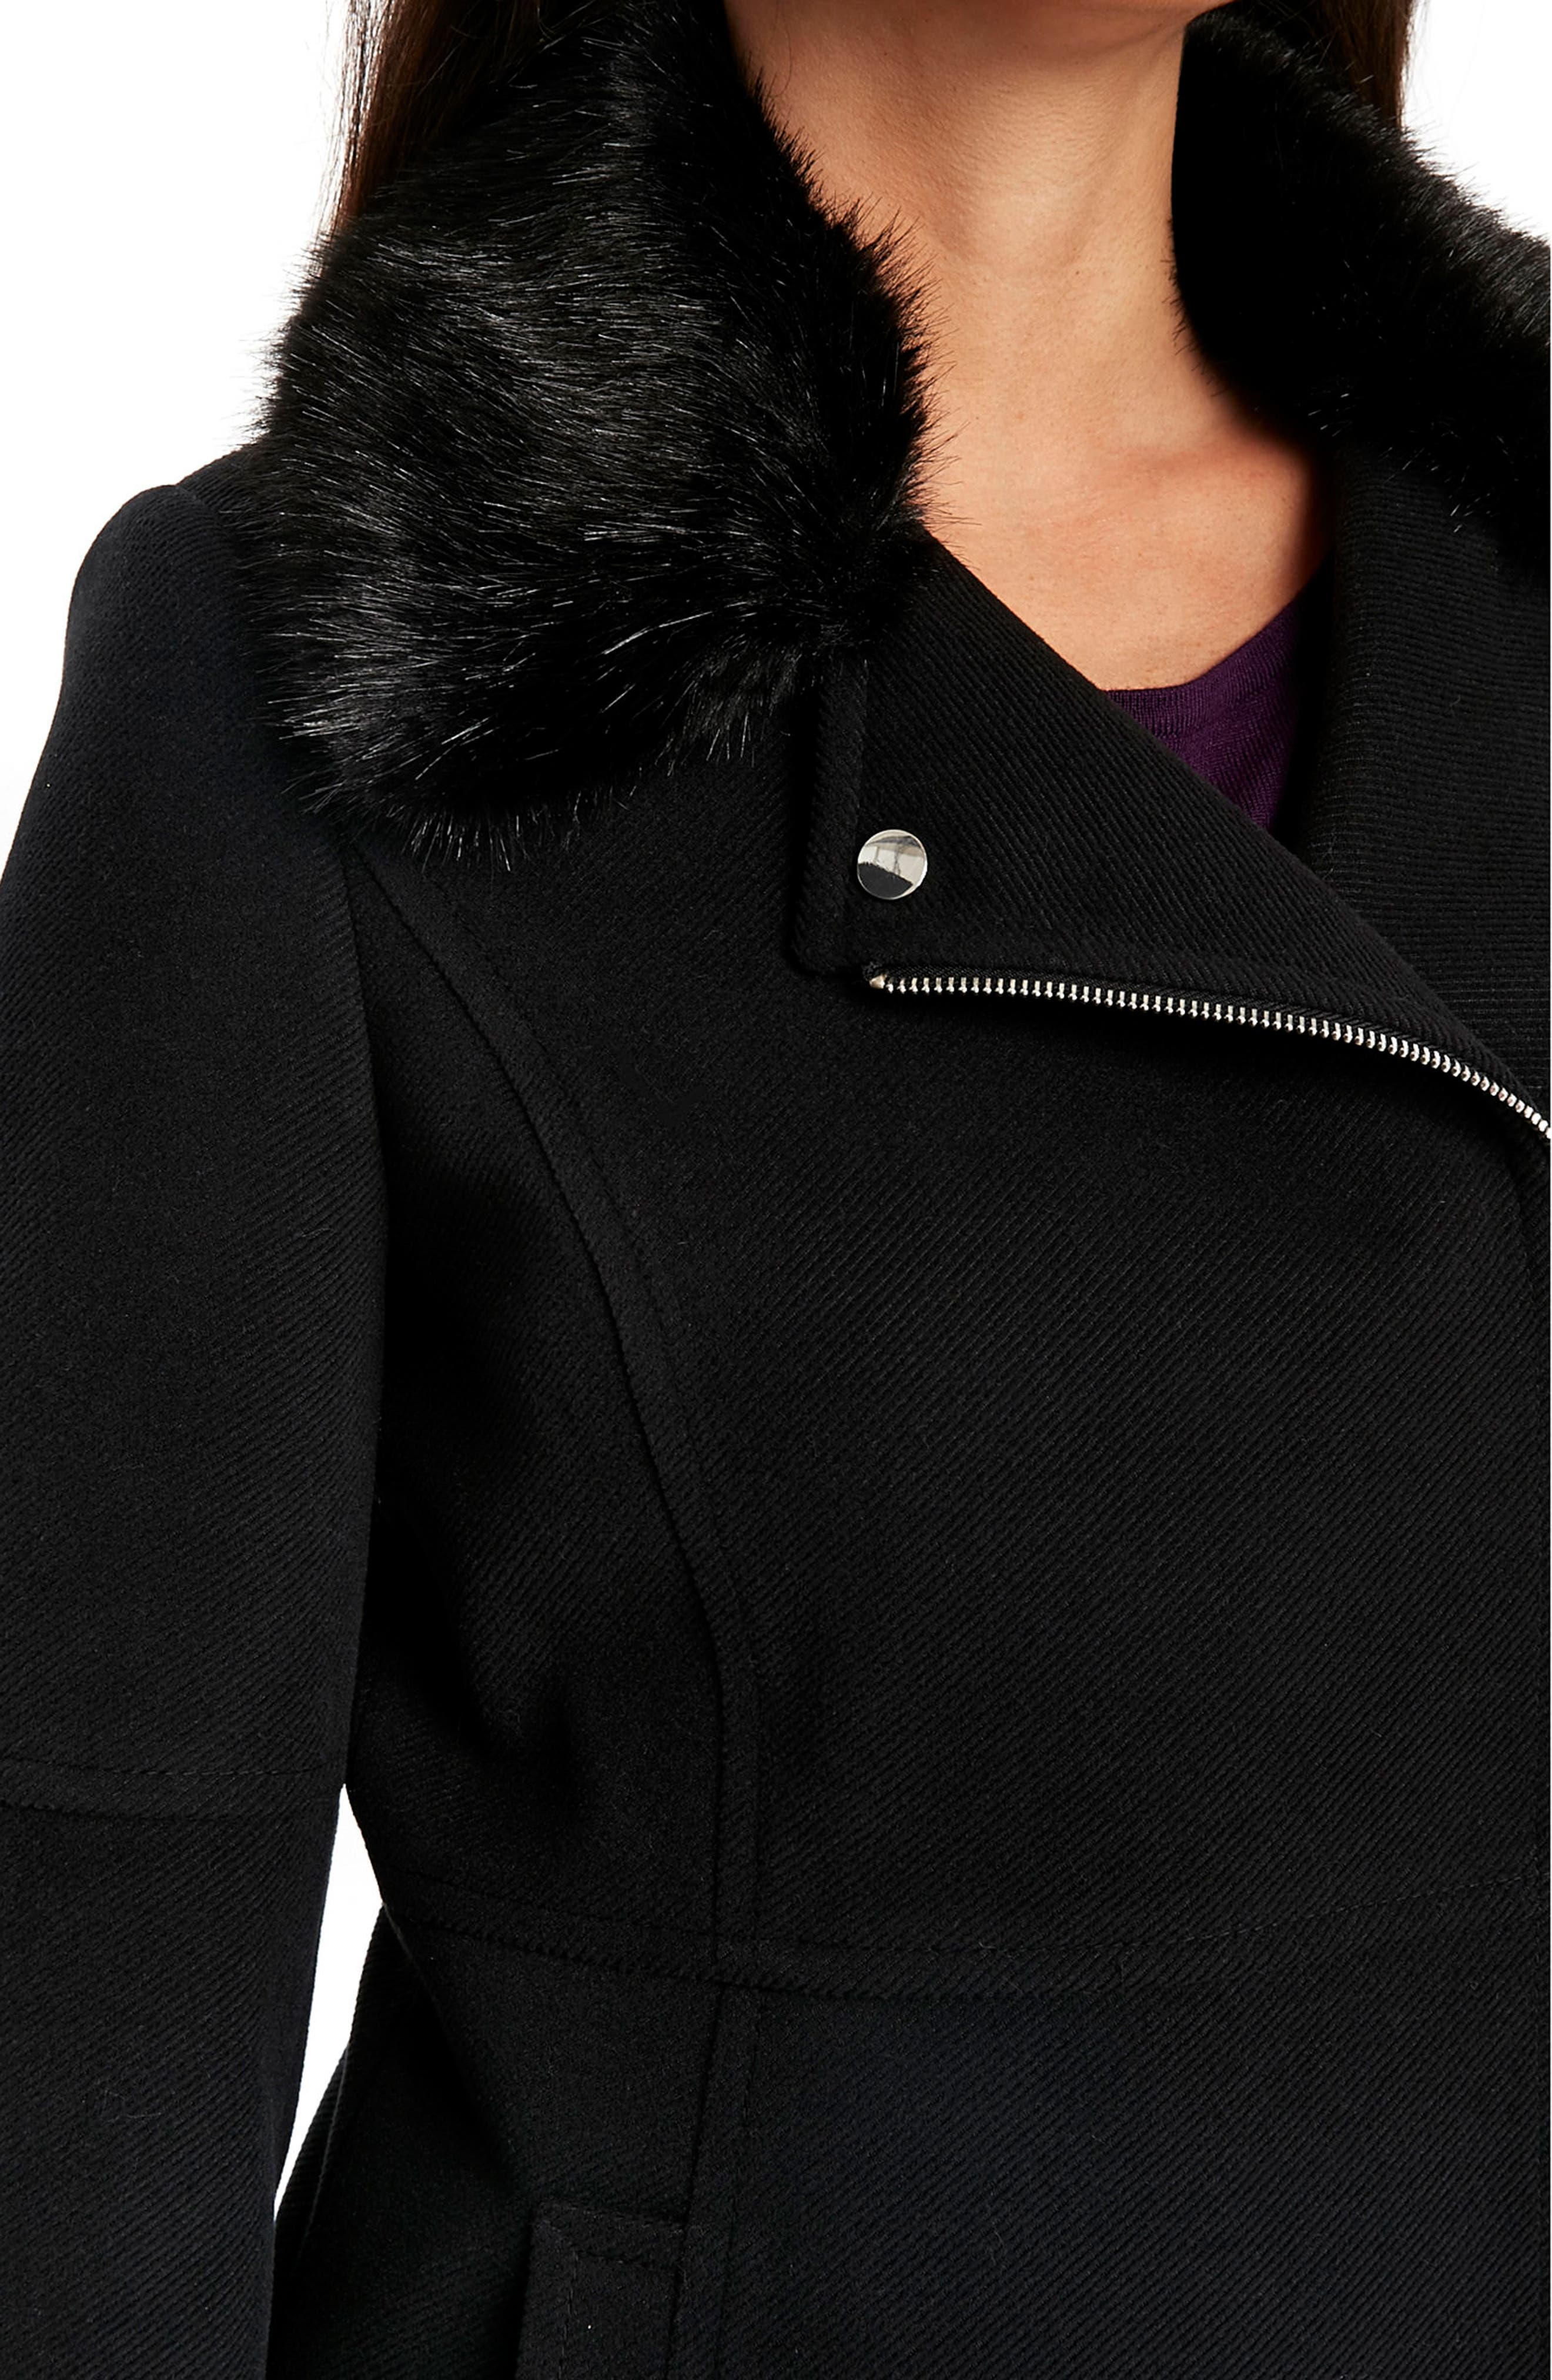 Twill Biker Jacket with Faux Fur Collar,                             Alternate thumbnail 3, color,                             Black